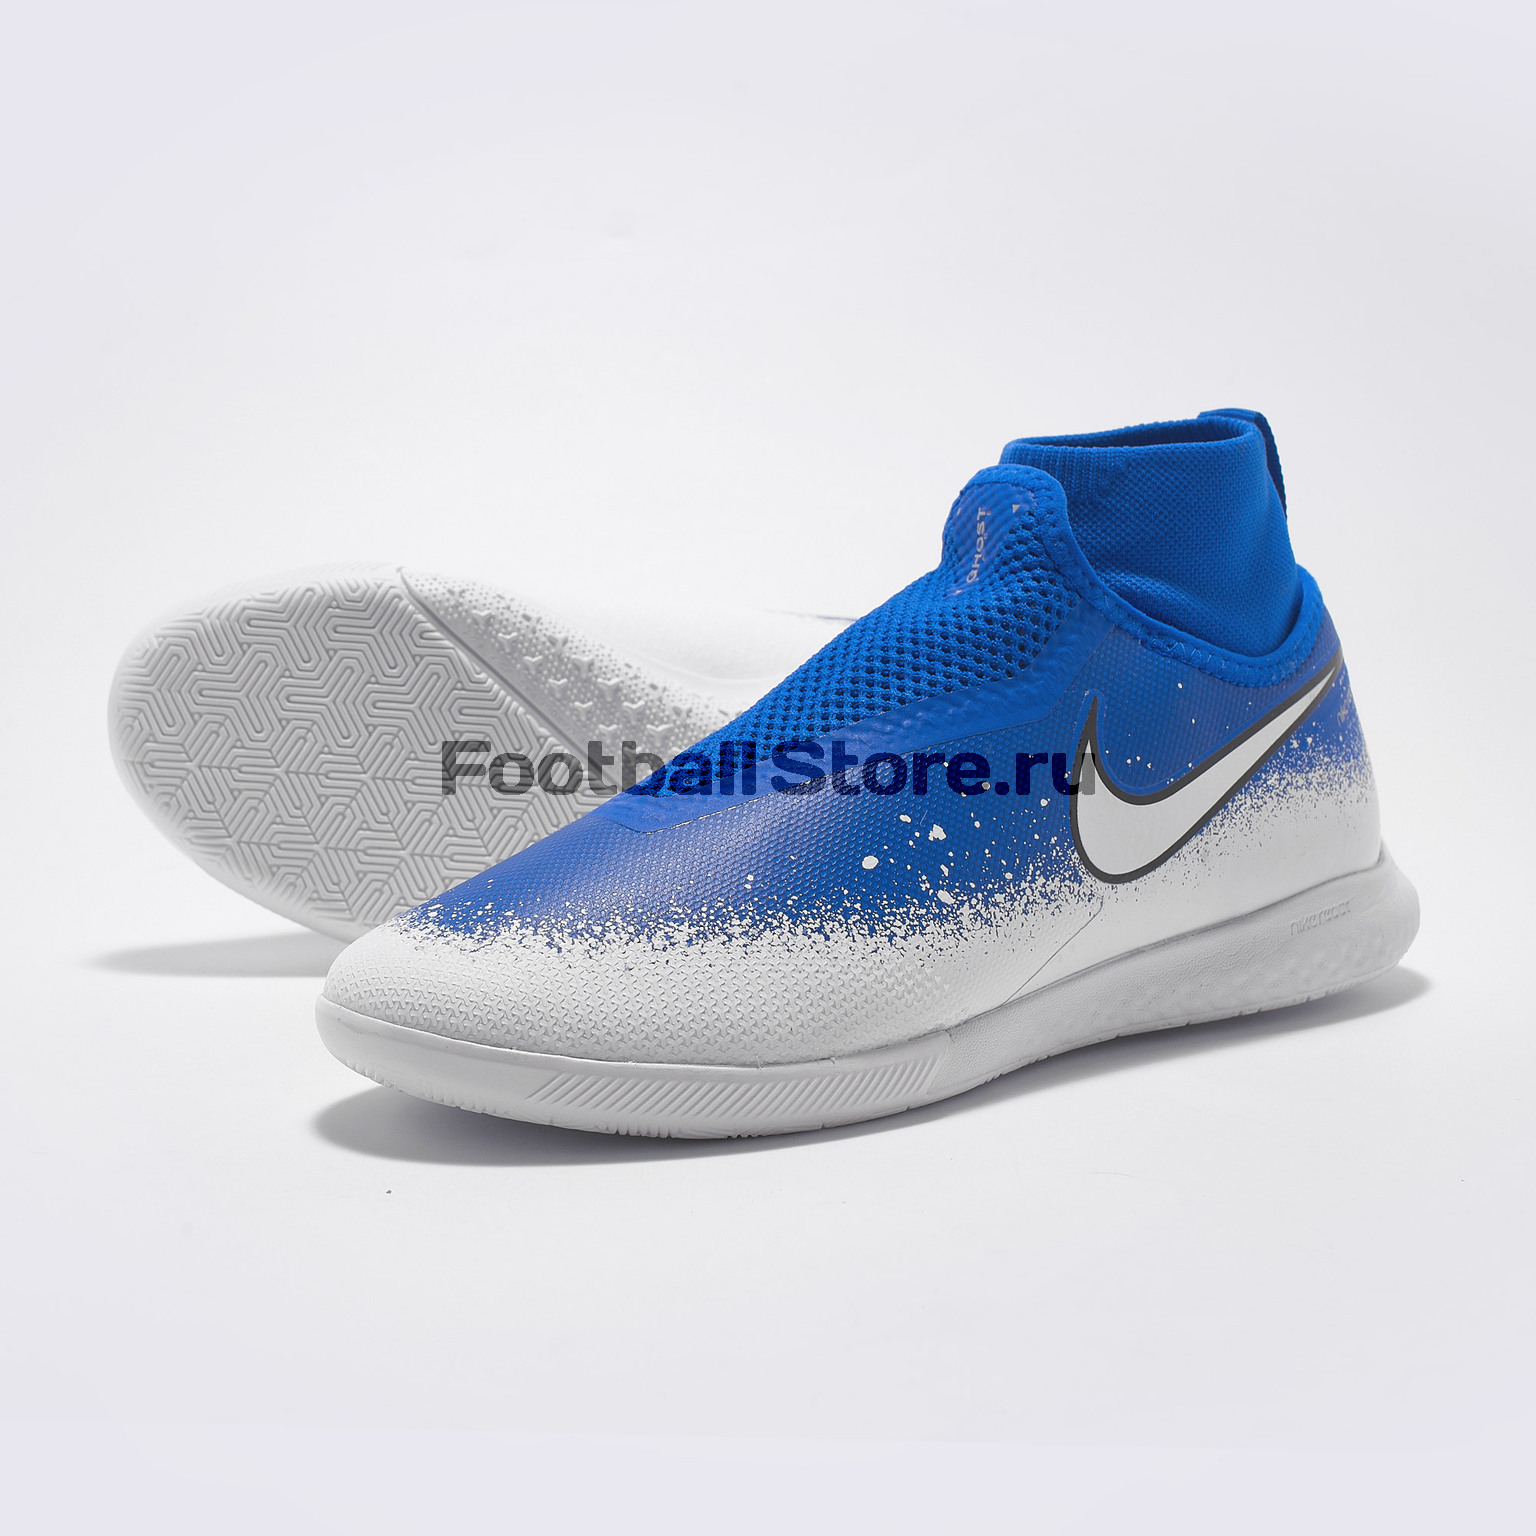 купить Футзалки Nike React Phantom Vision Pro DF IC AO3276-410 недорого